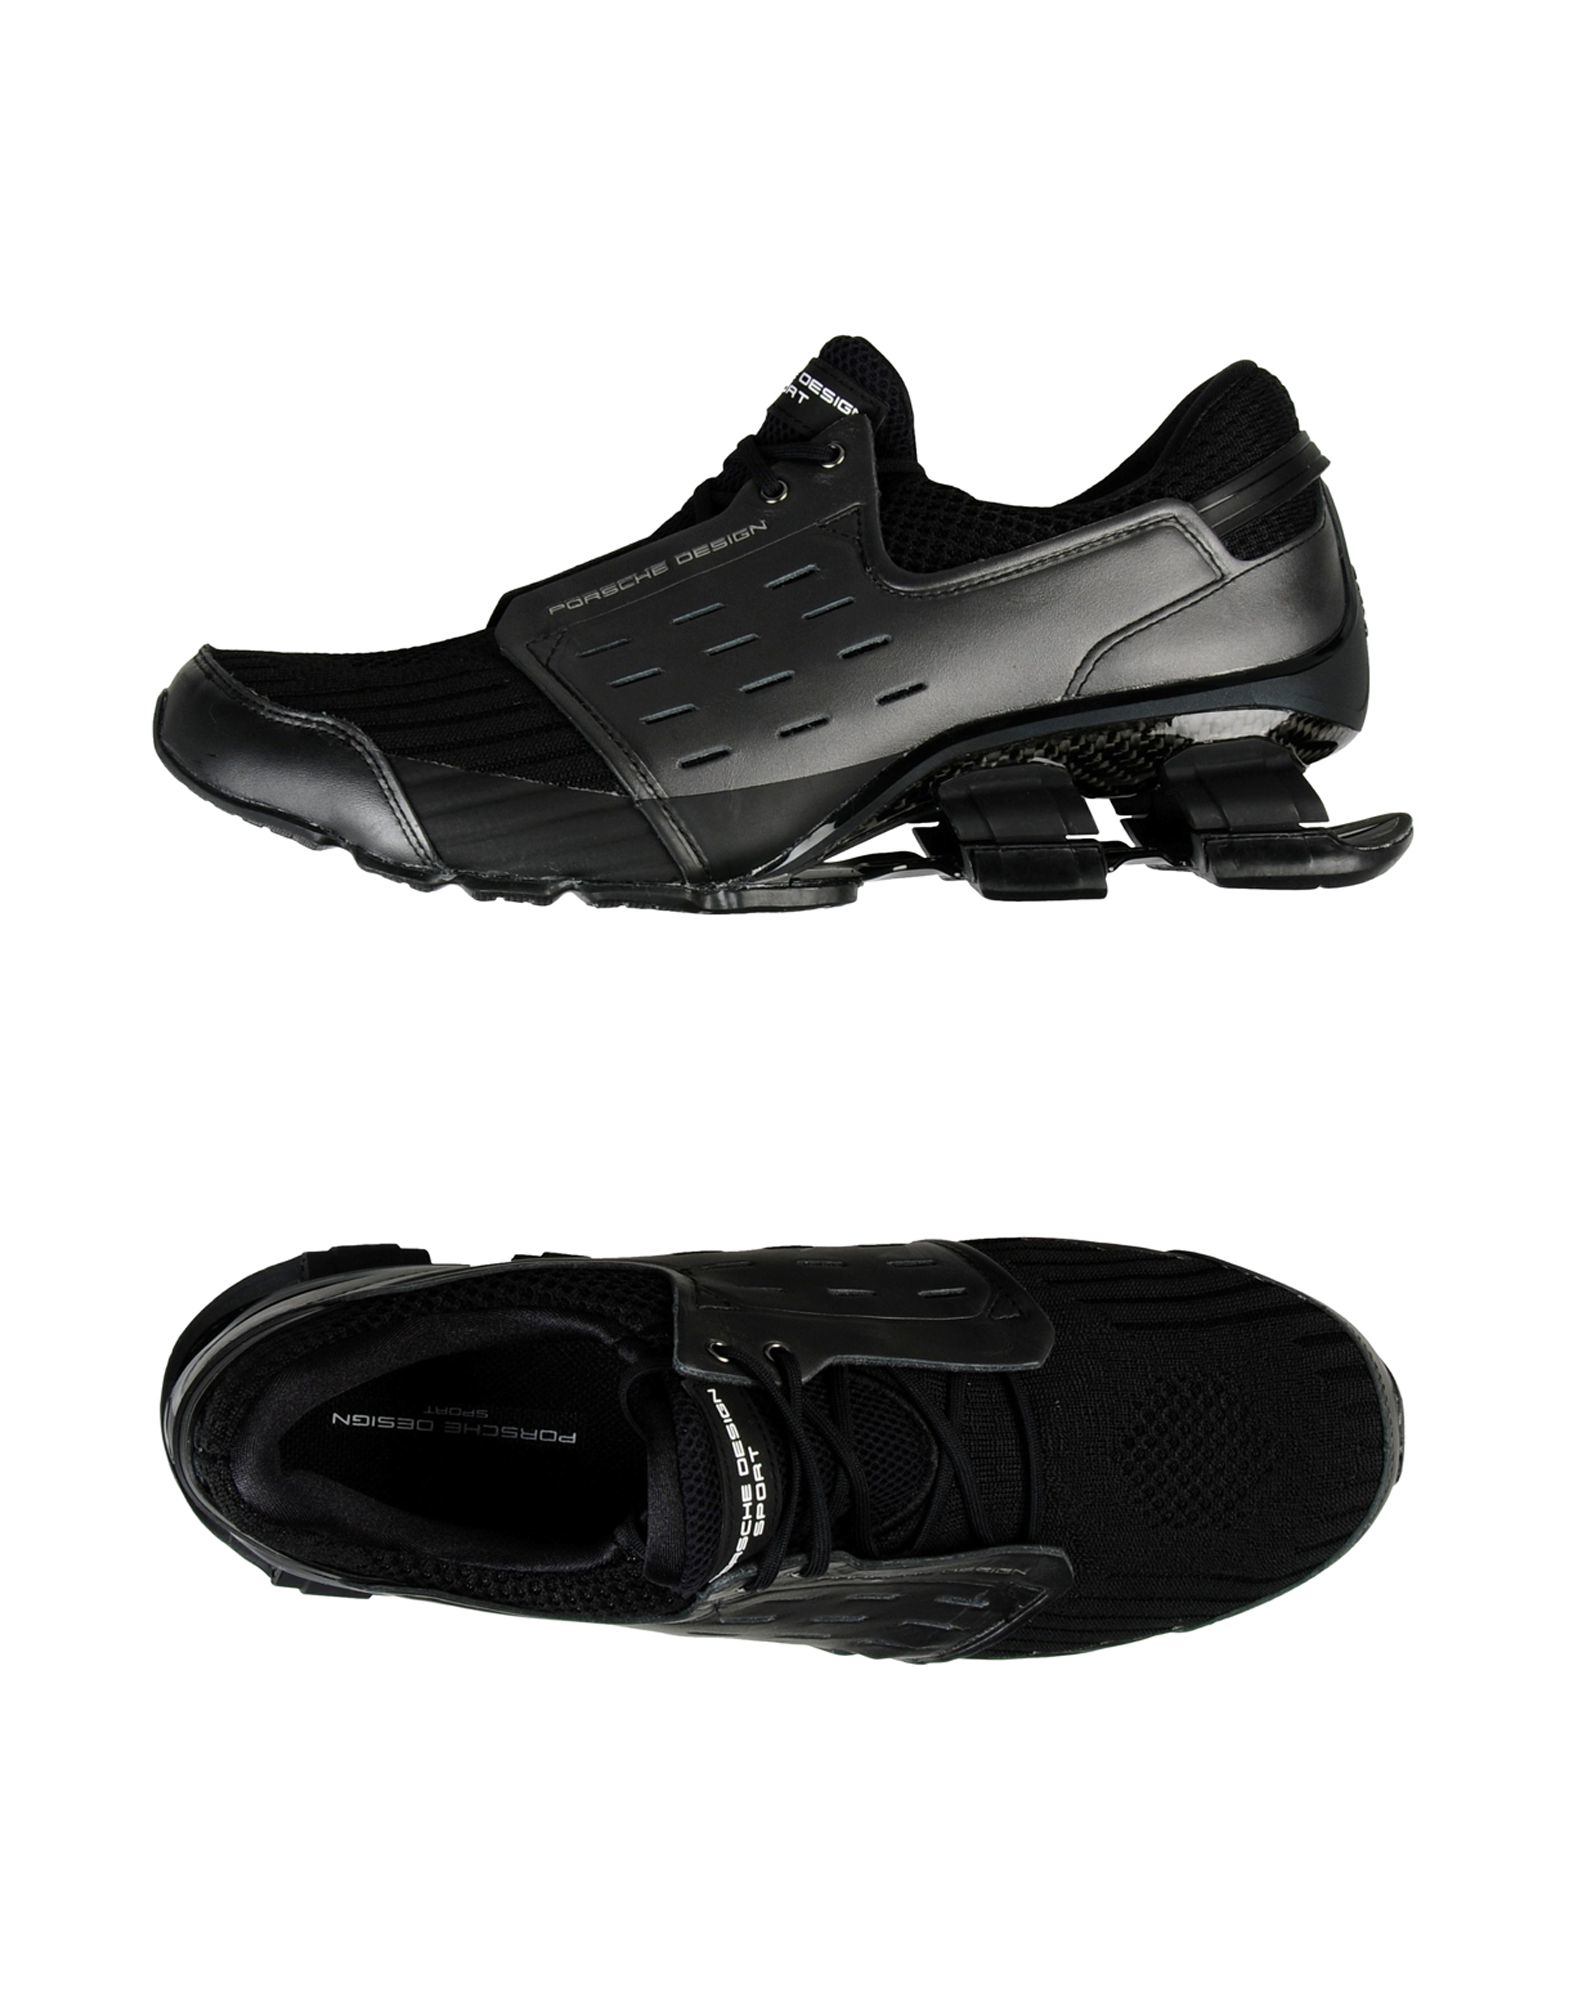 porsche design low tops sneakers in black for men lyst. Black Bedroom Furniture Sets. Home Design Ideas